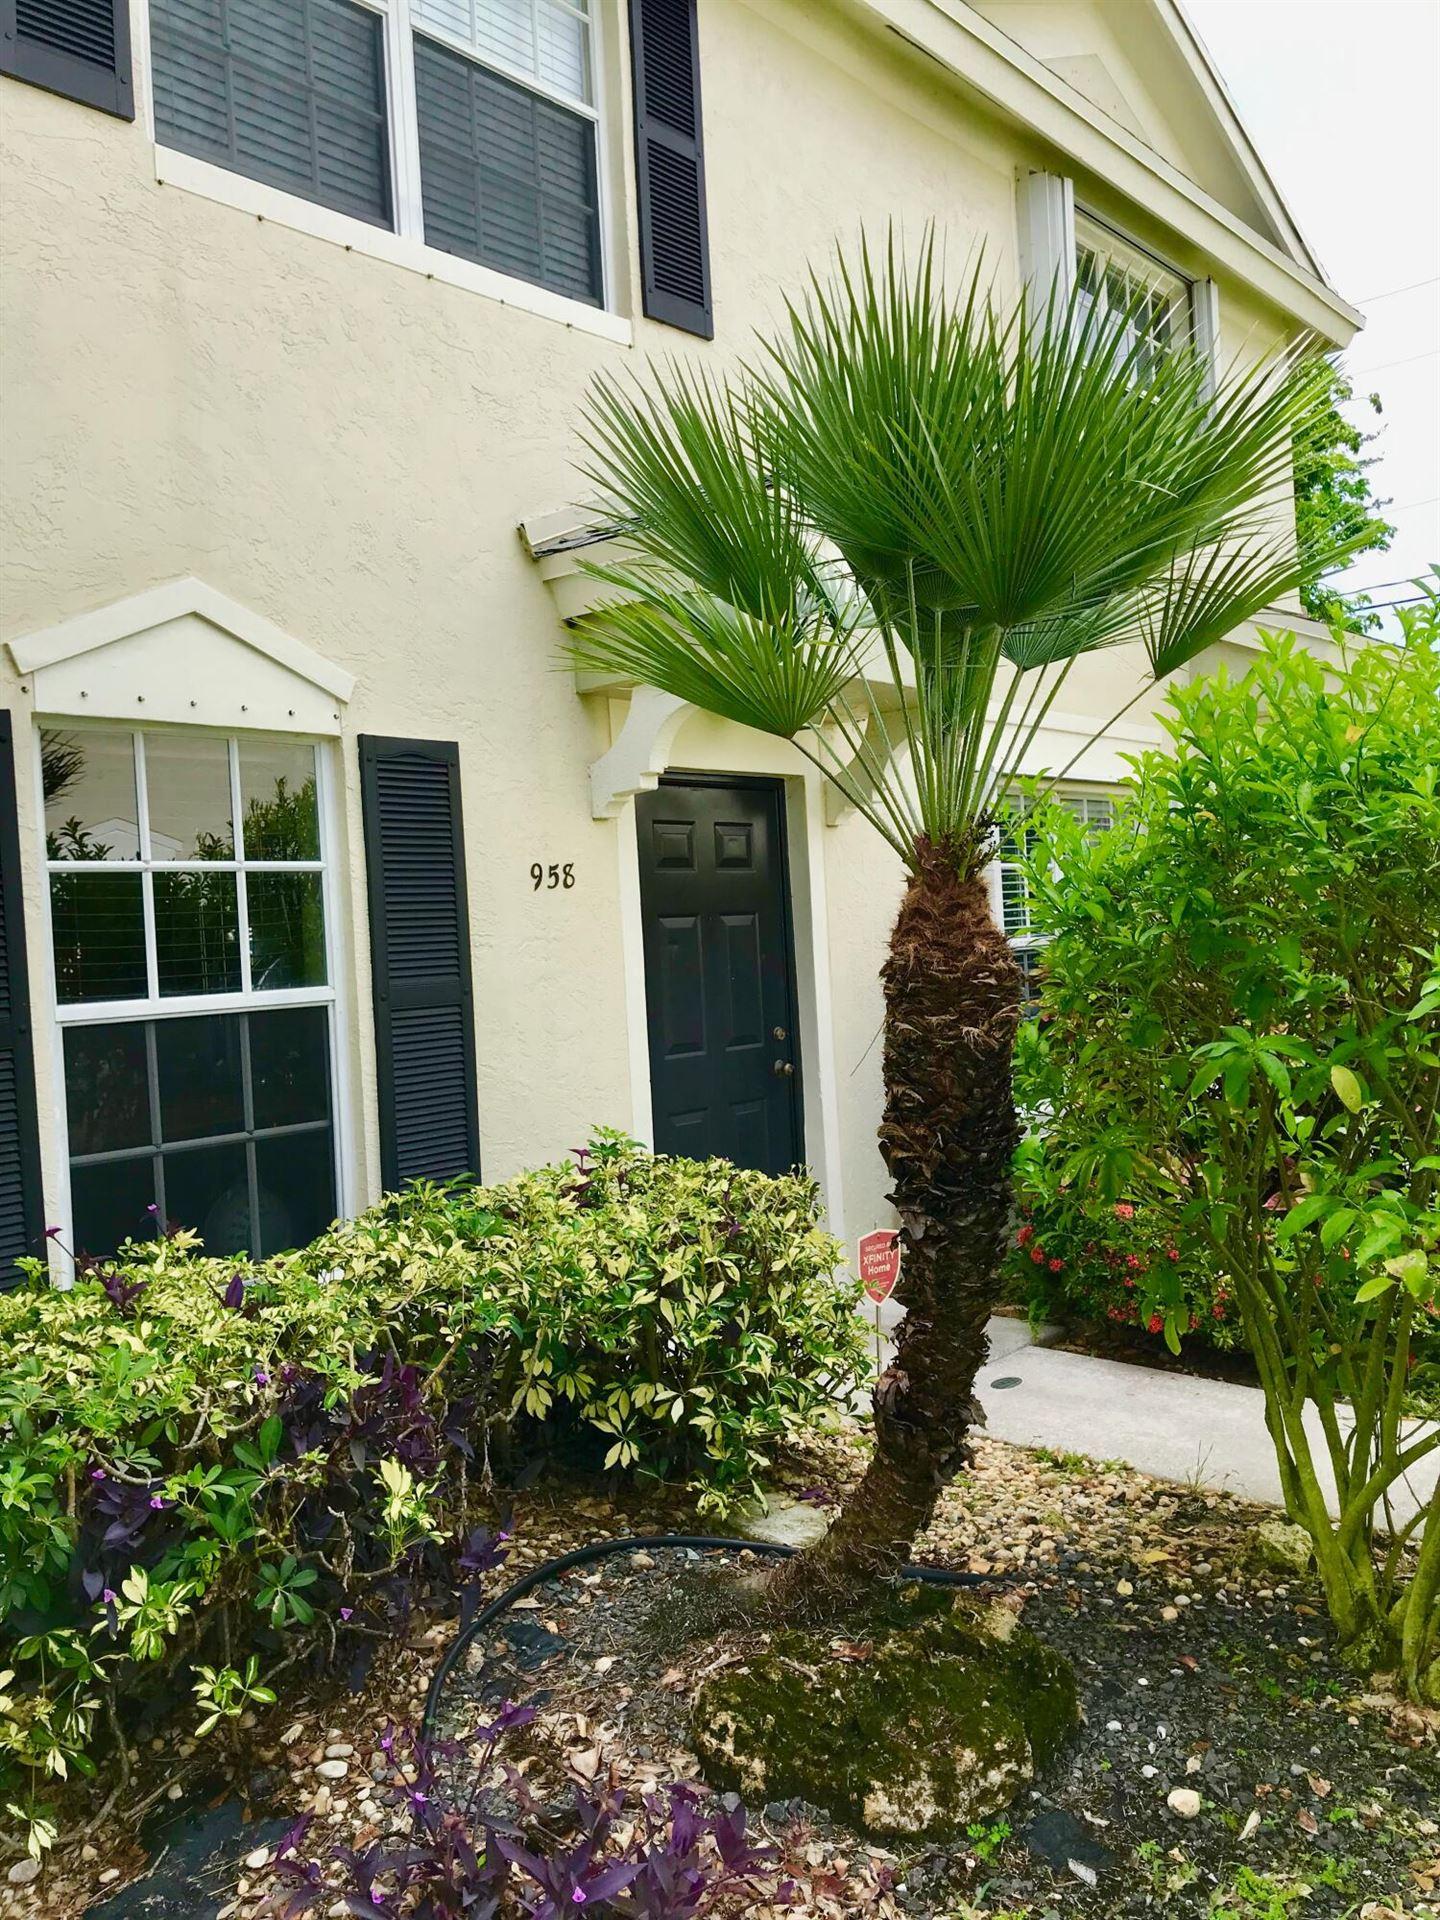 Photo of 958 Kokomo Key Lane, Delray Beach, FL 33483 (MLS # RX-10733275)